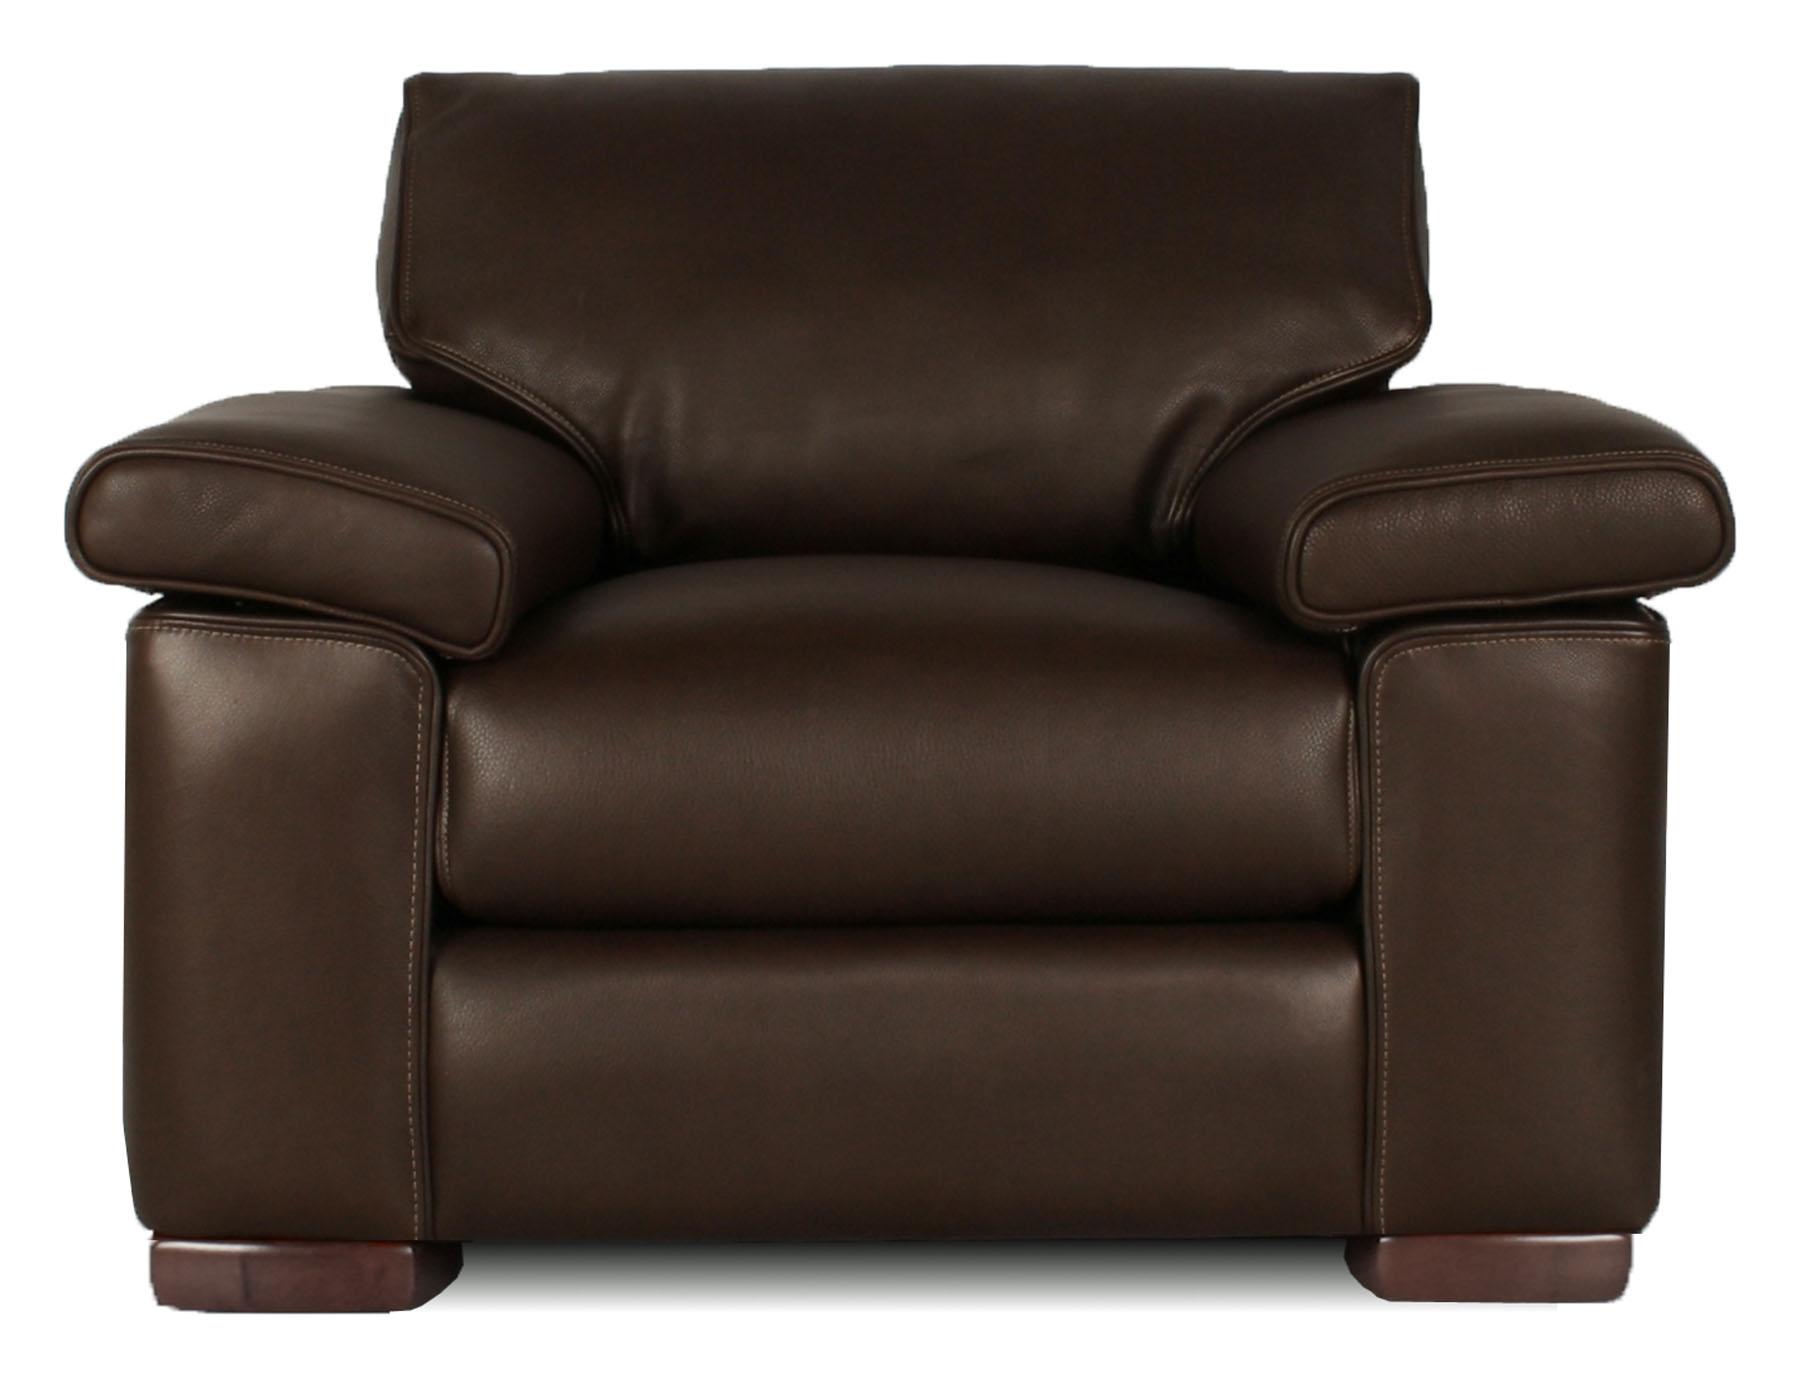 Custom Leather Sofa Custom Leather Couch Atlanta